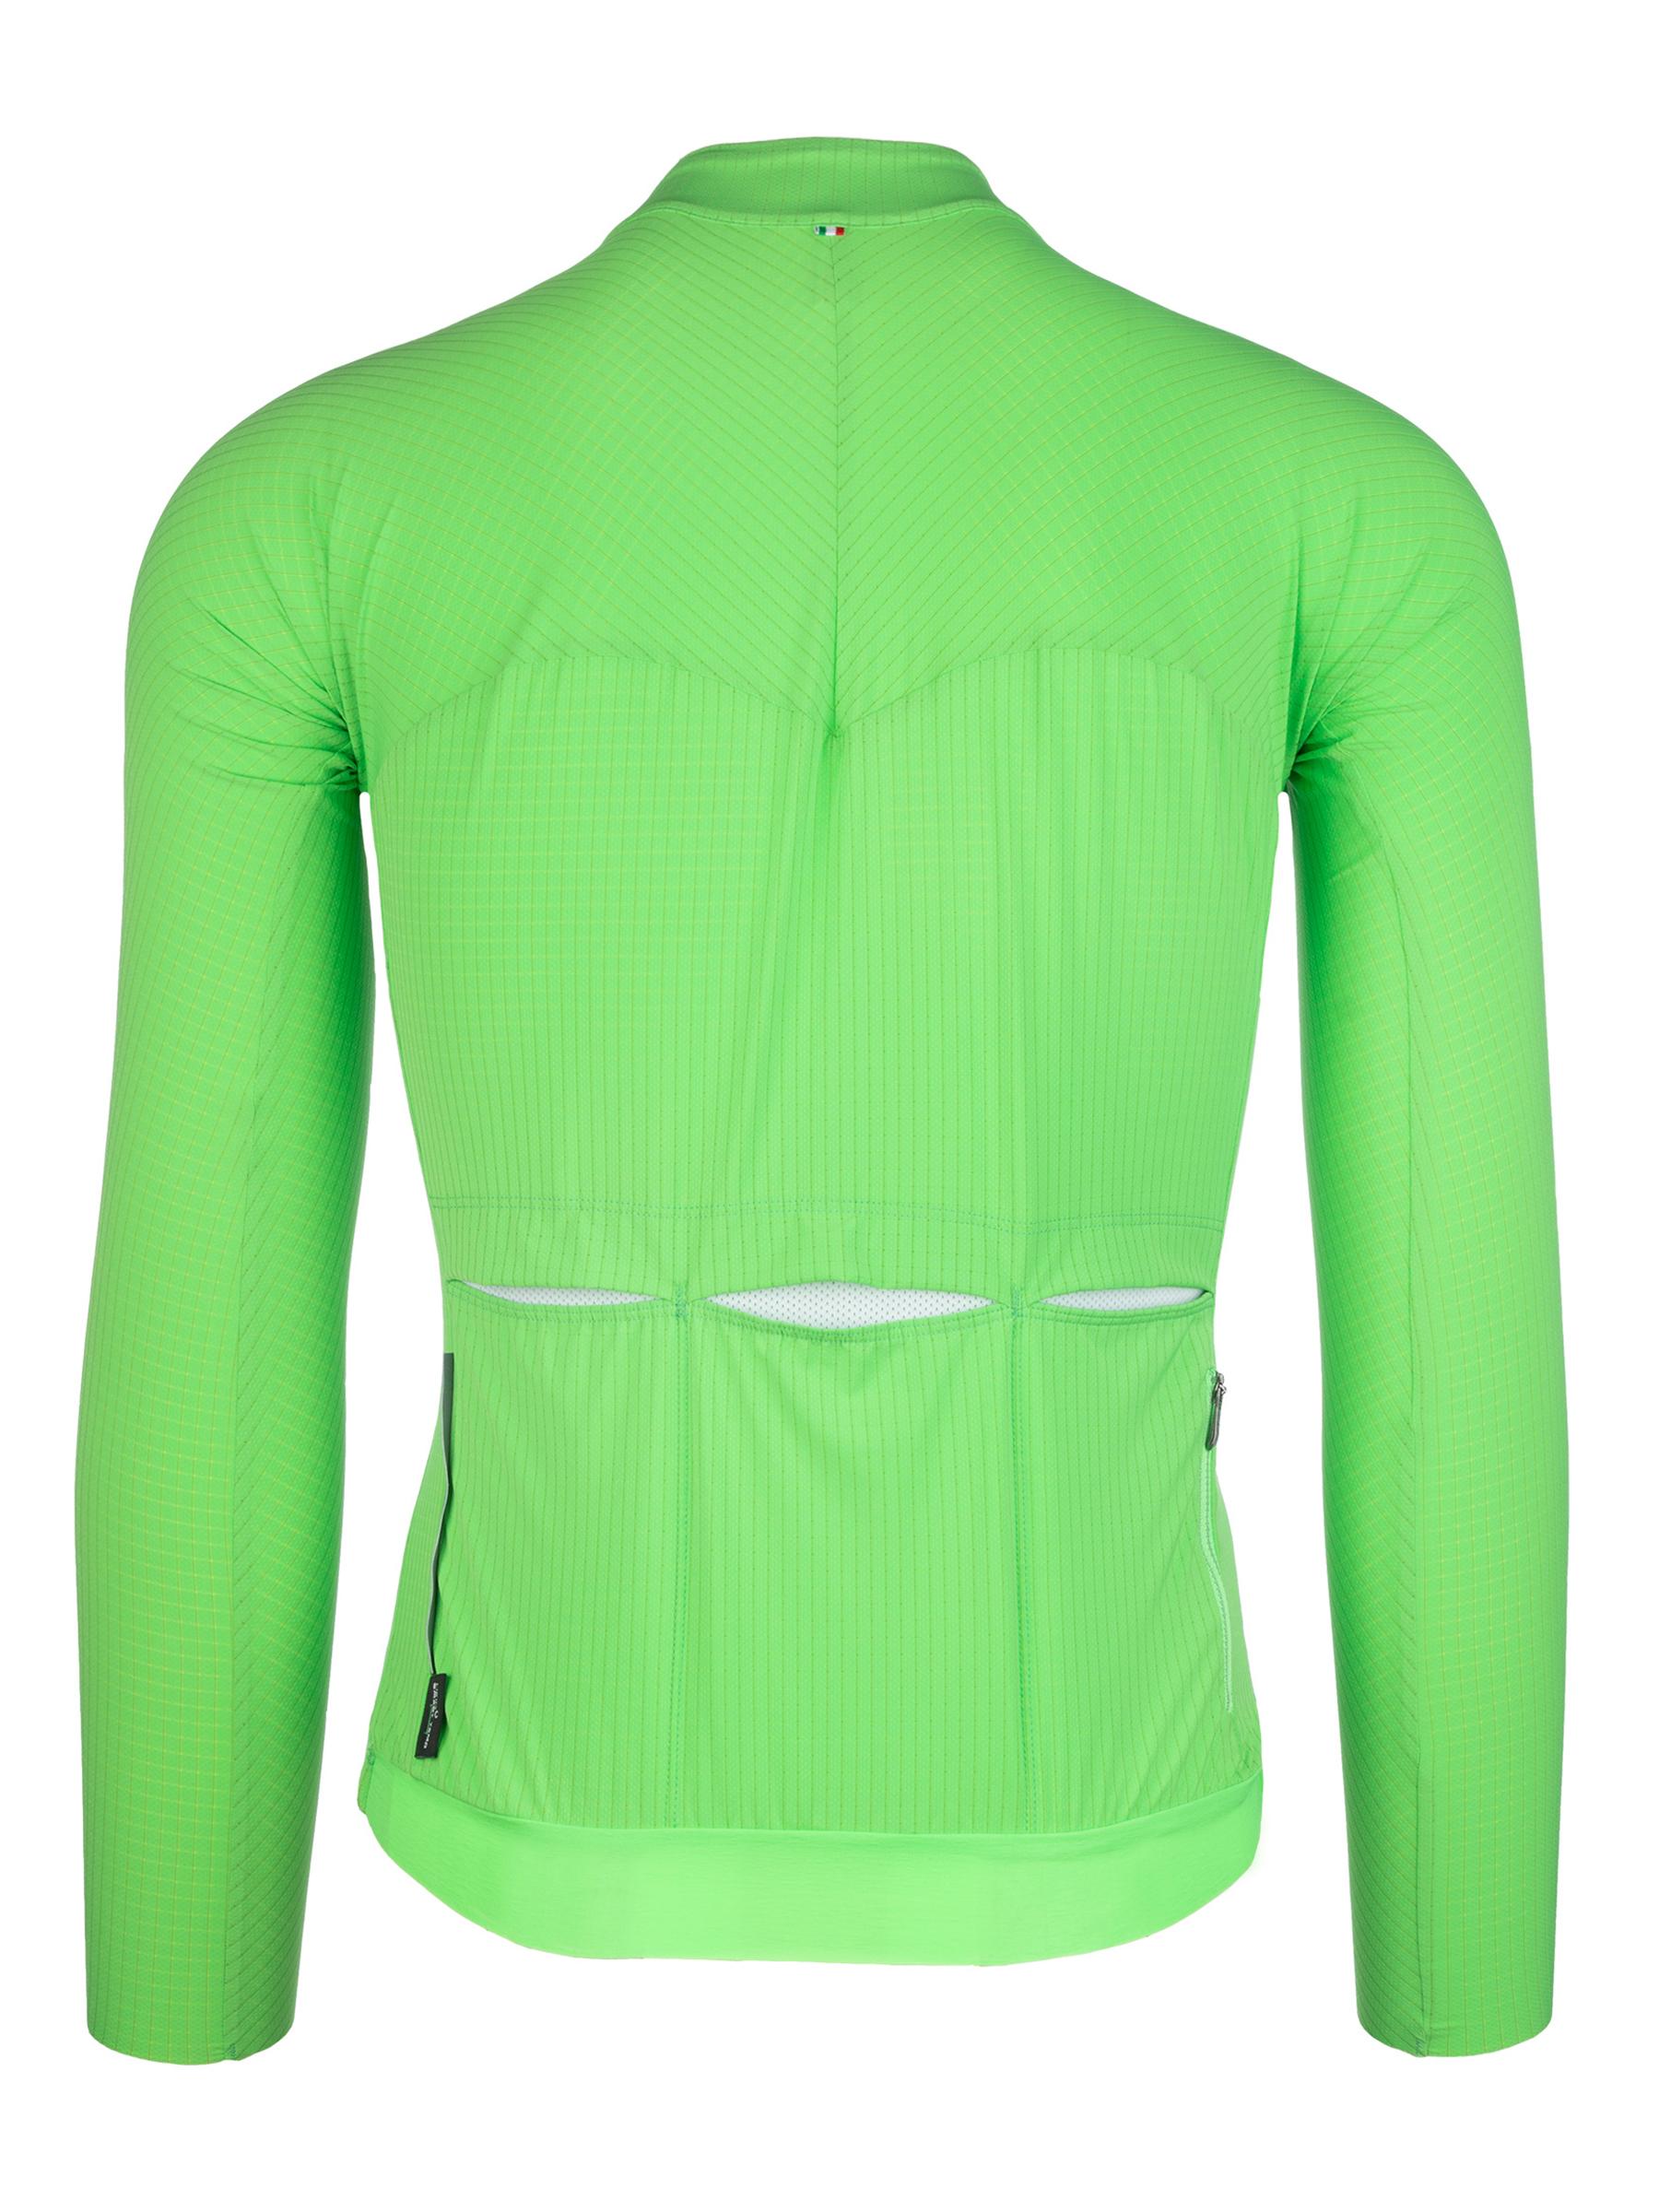 Jersey long sleeve L1 Pinstripe X green